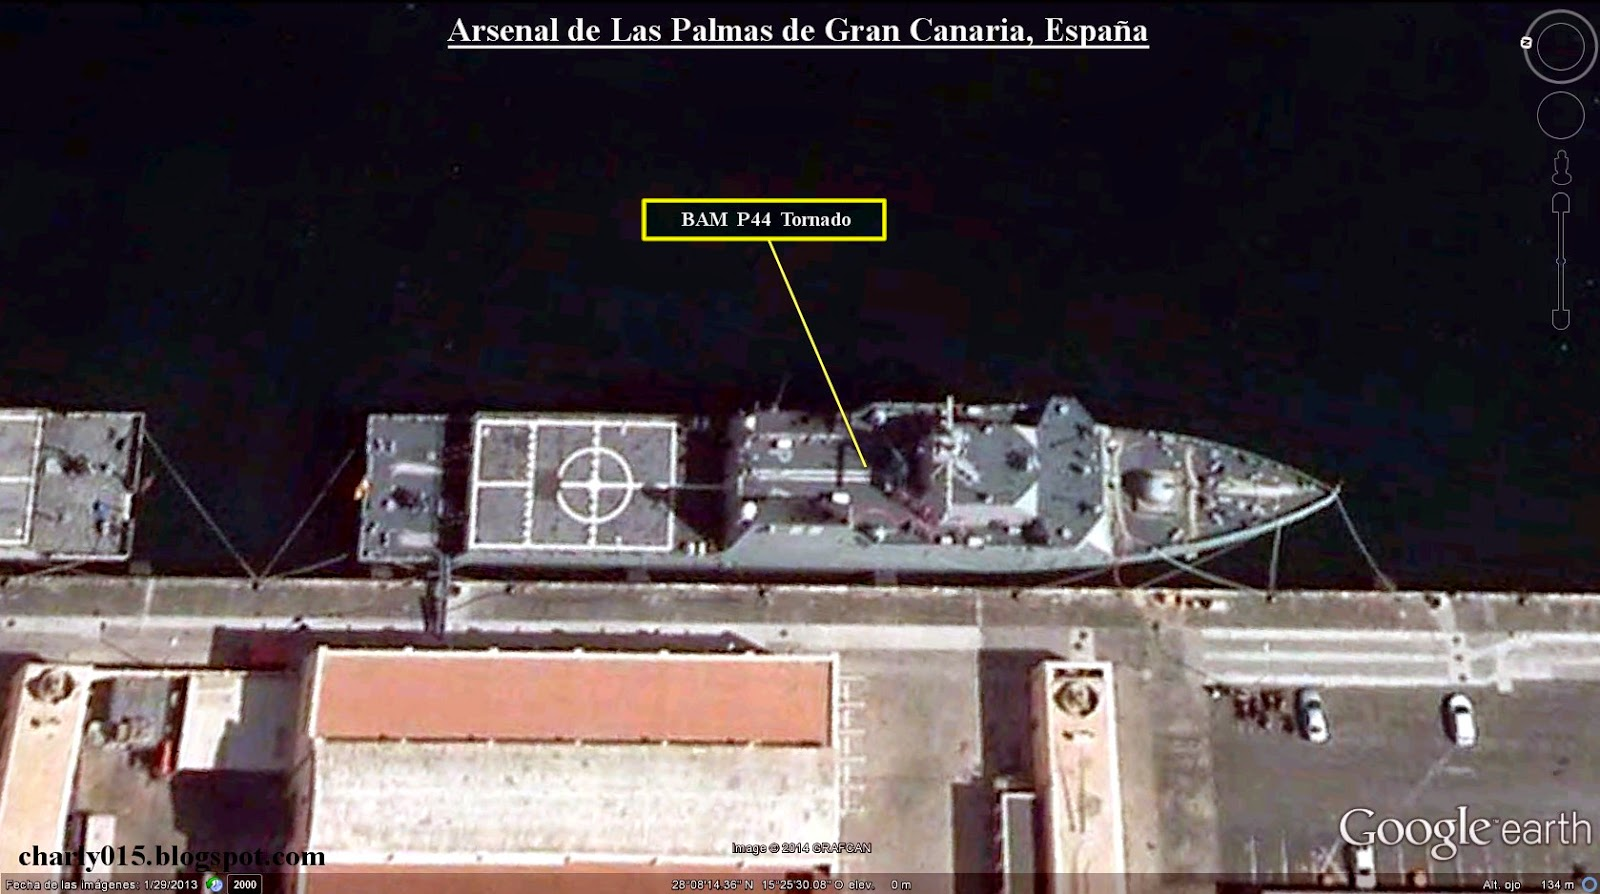 An lisis militares el bam de la armada espa ola for Oficina de correos las palmas de gran canaria